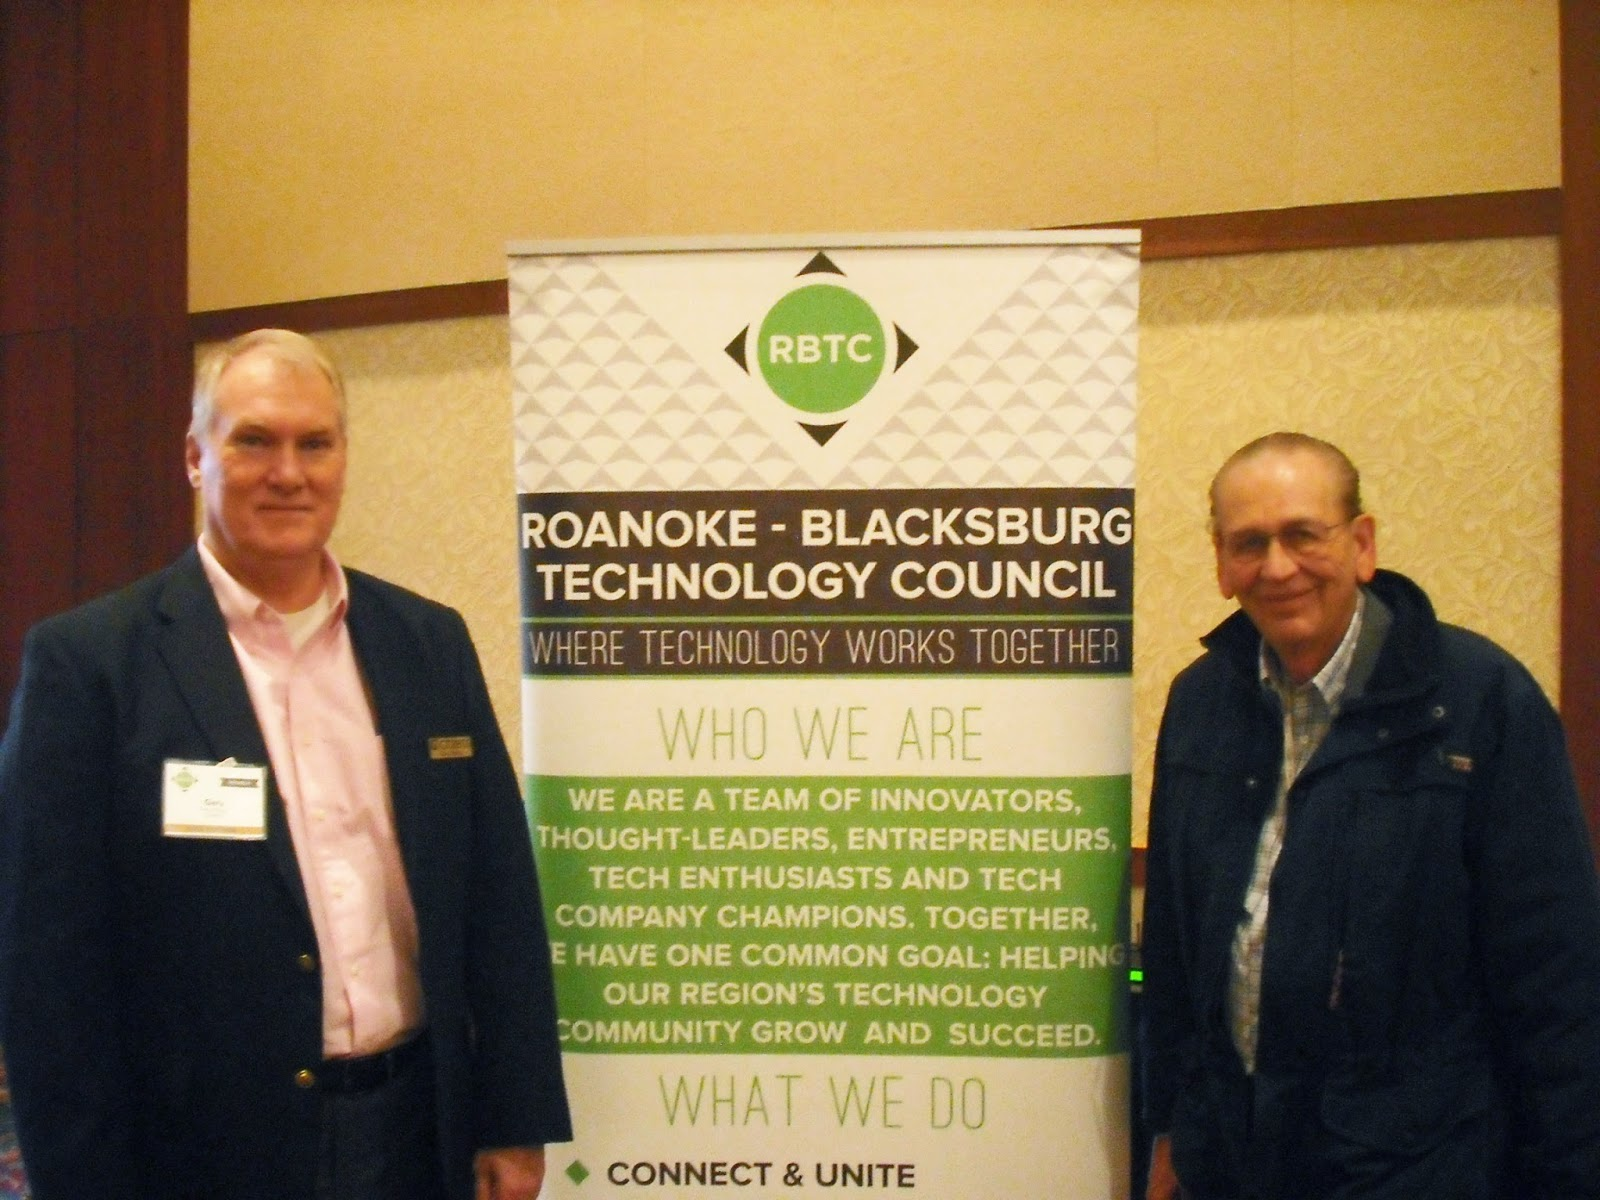 Roanoke Blacksburg Technology Council